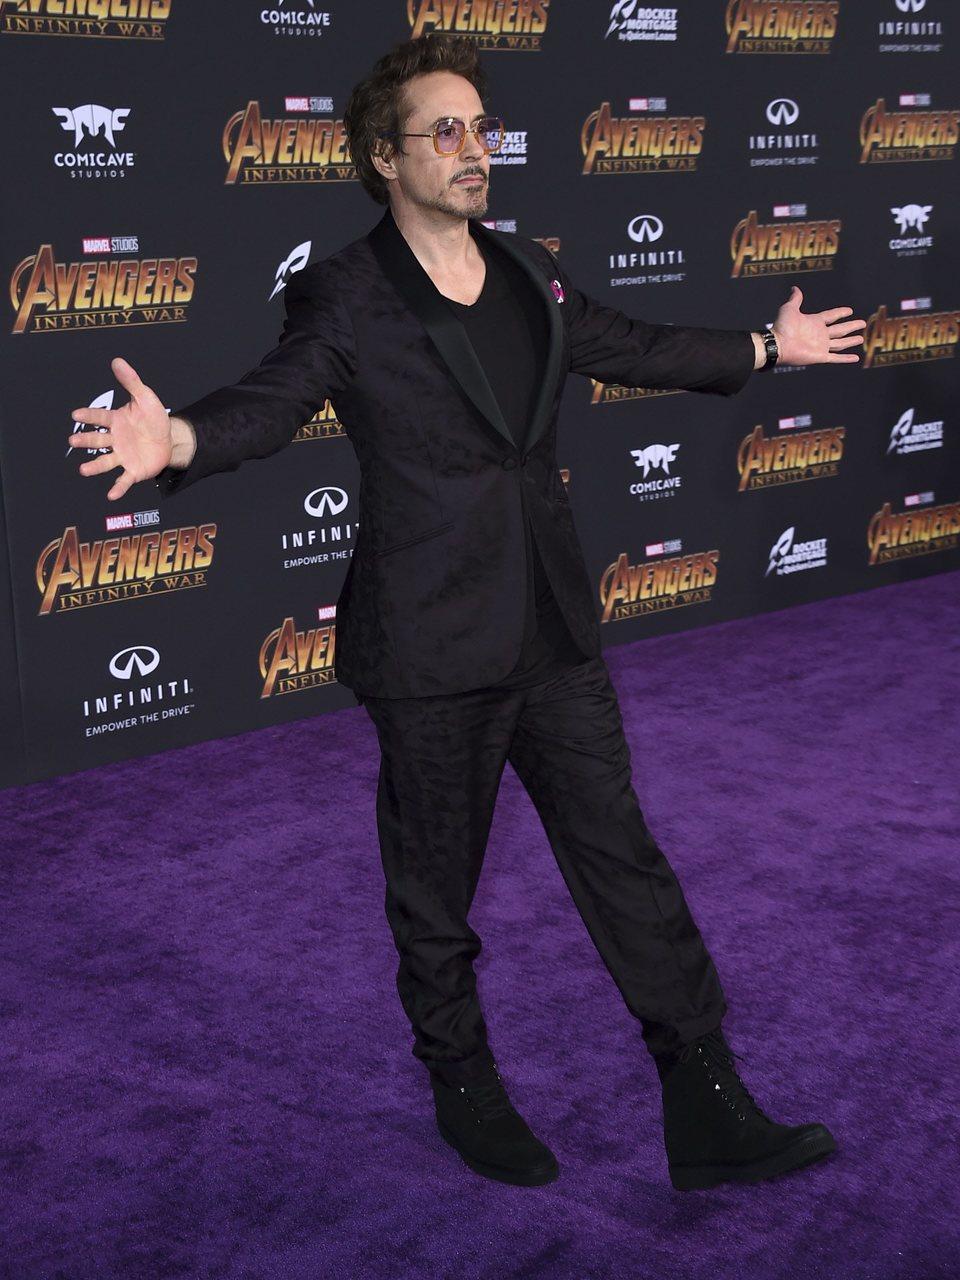 Robert Downey Jr. at the 'Avengers: Infinity War' purple carpet